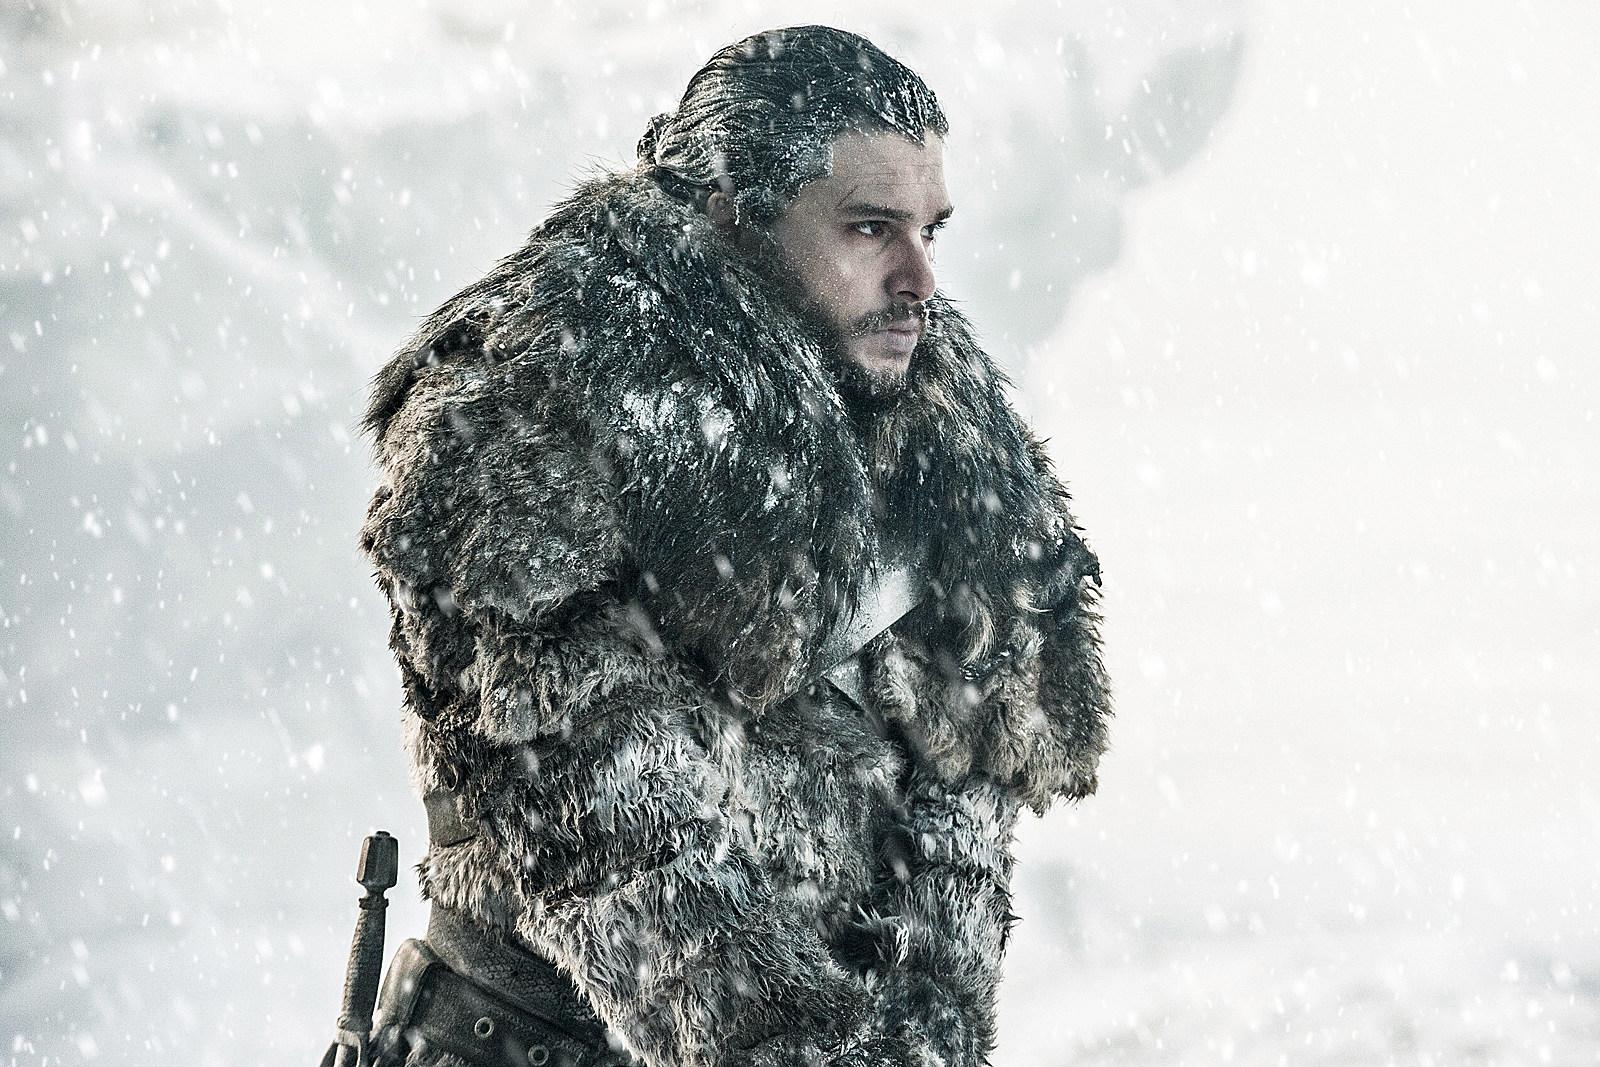 Game of Thrones Benjen Coldhands Death Confirmed